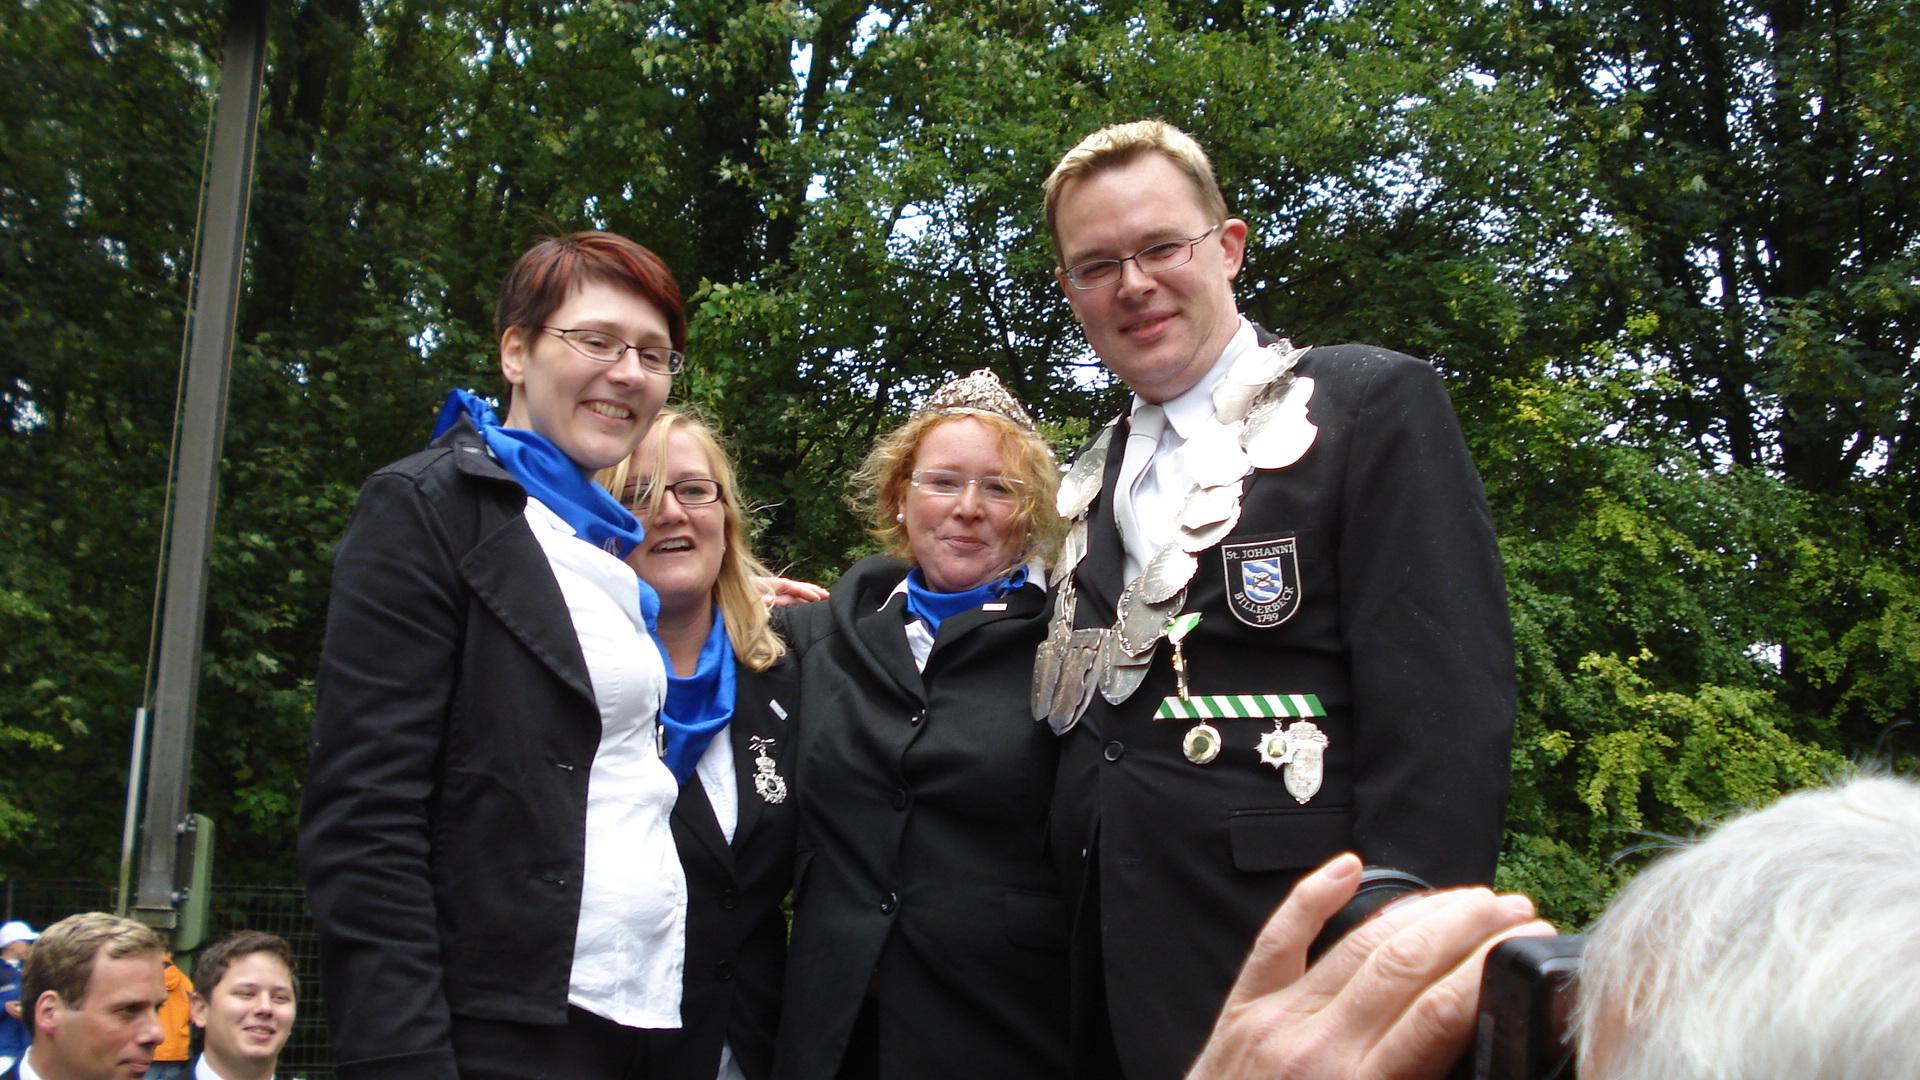 König 2011: Carsten Rampe, Königin: Sandra Terbone, Ehrendamen: Friederike Rottmann und Andra Leifeld